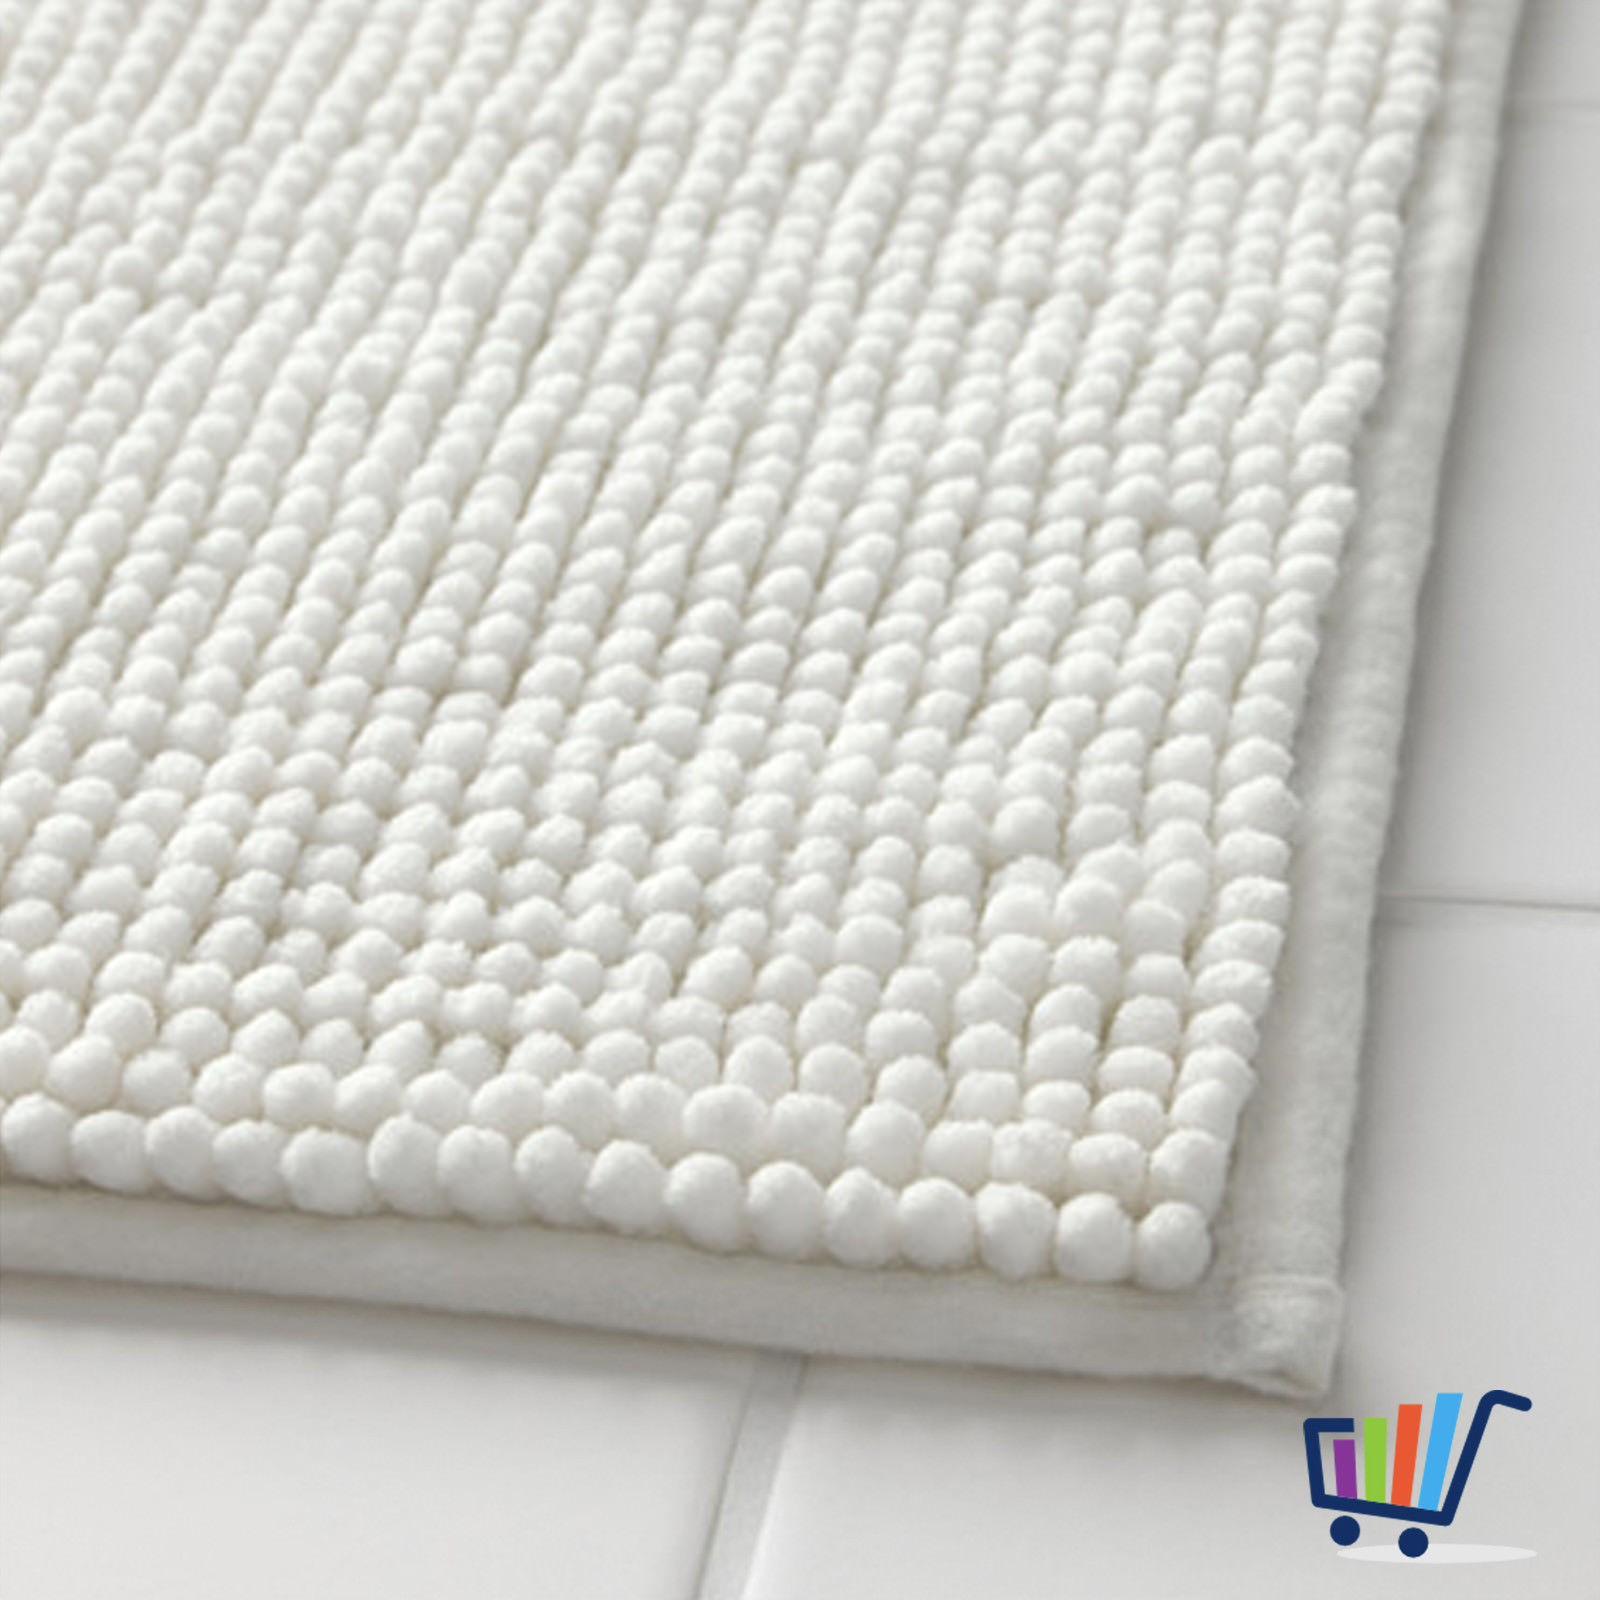 ikea toftbo duschmatte 60 90 cm wei matte vorleger. Black Bedroom Furniture Sets. Home Design Ideas